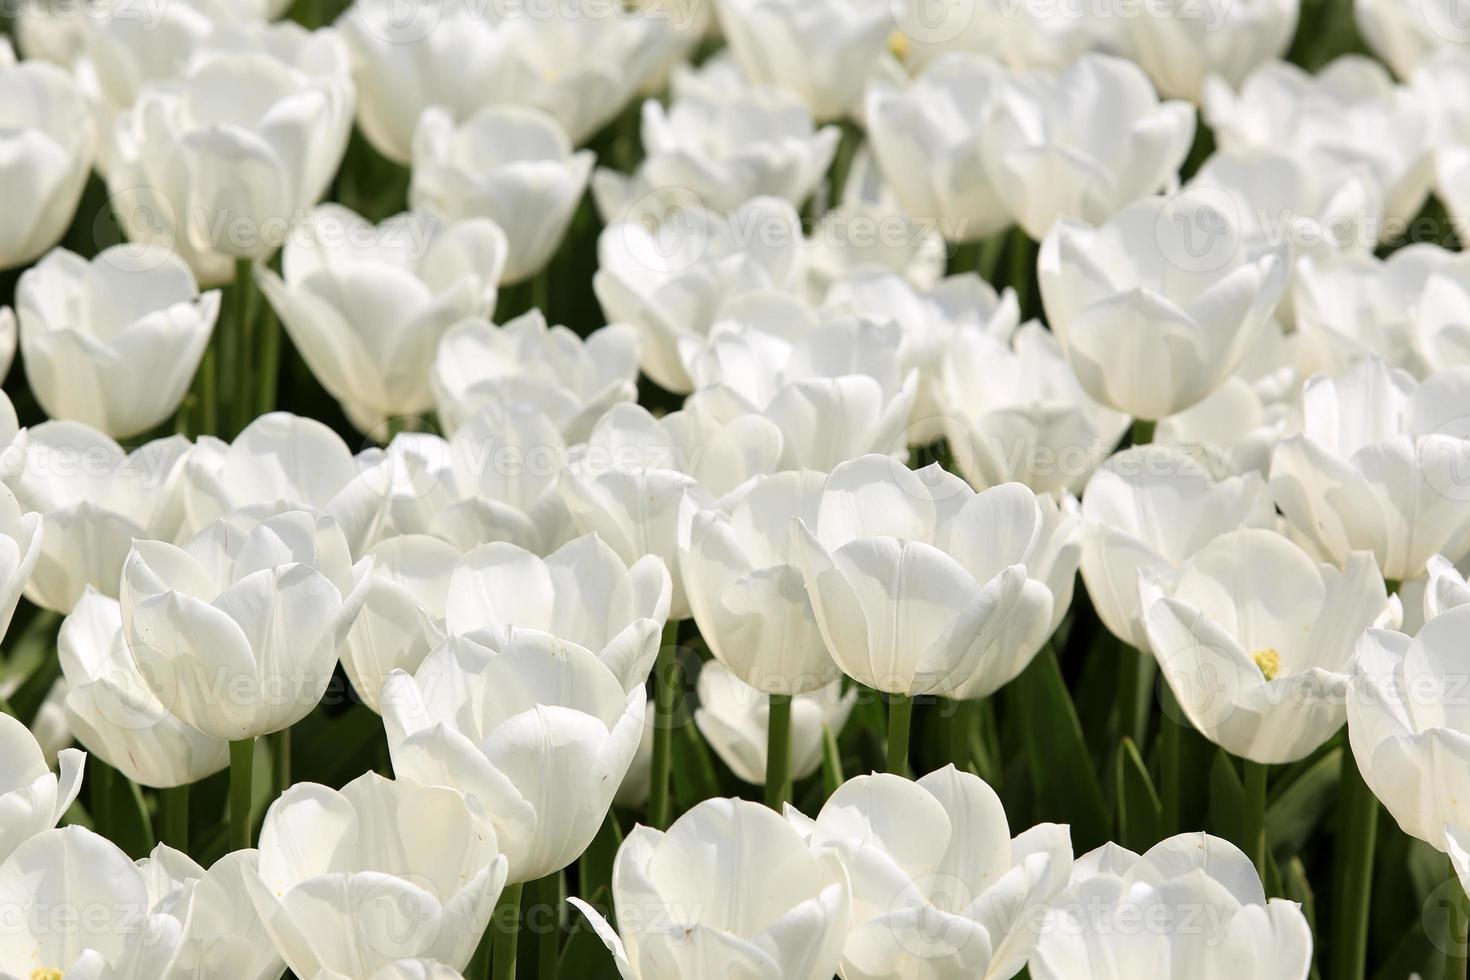 bunte Tulpen und Muscari Blumen foto